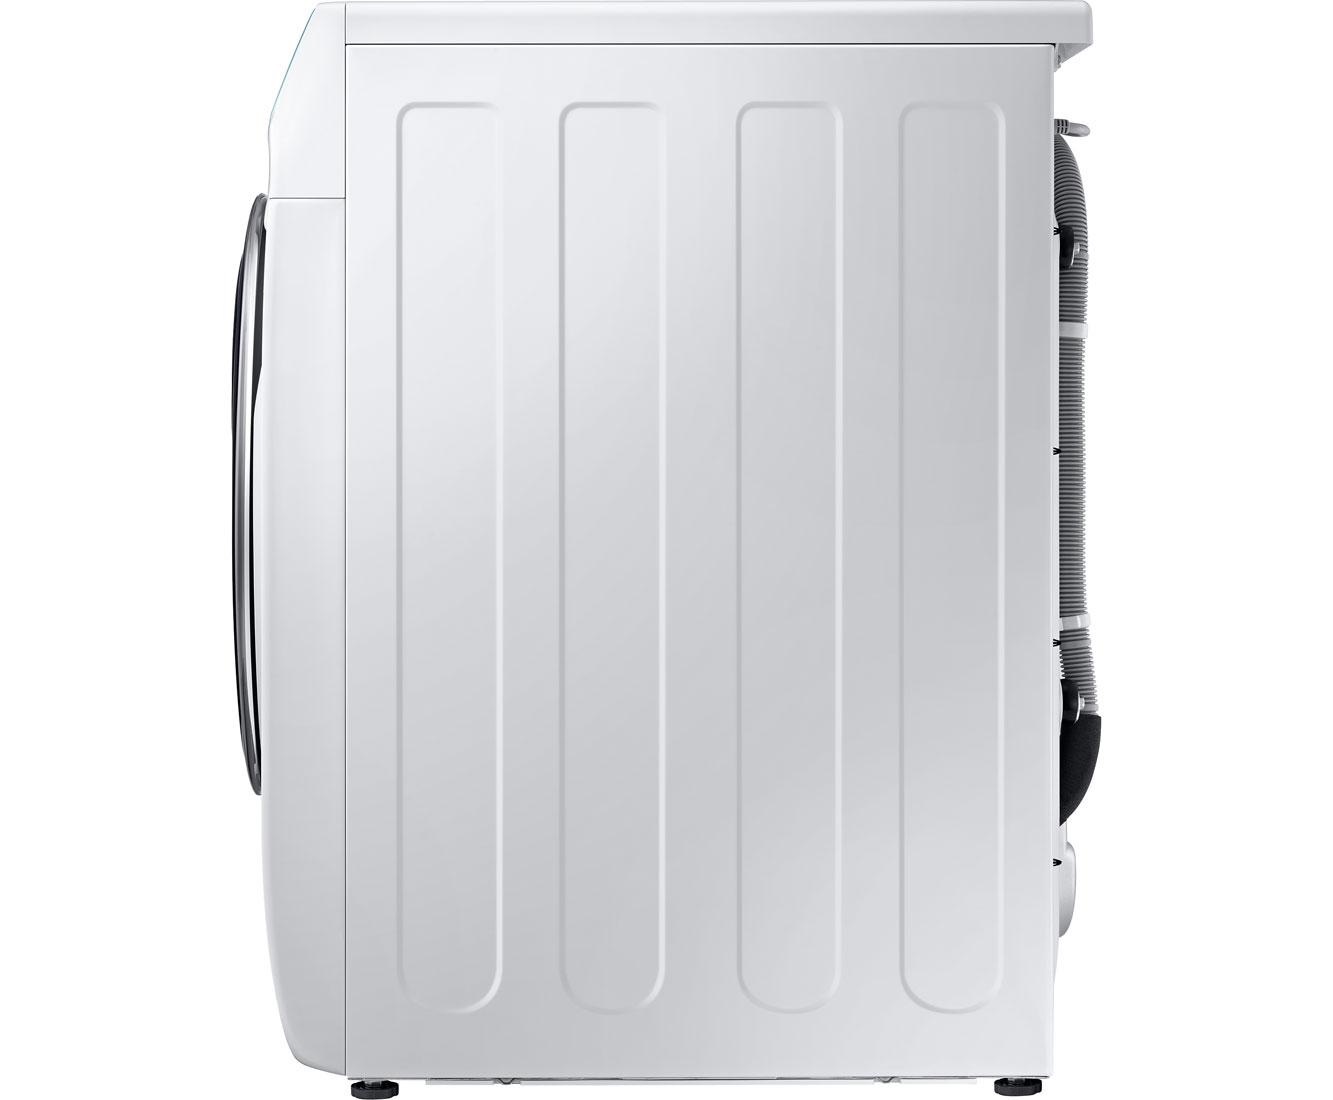 samsung ww10m86bqoa eg waschmaschine freistehend wei 223 neu ebay